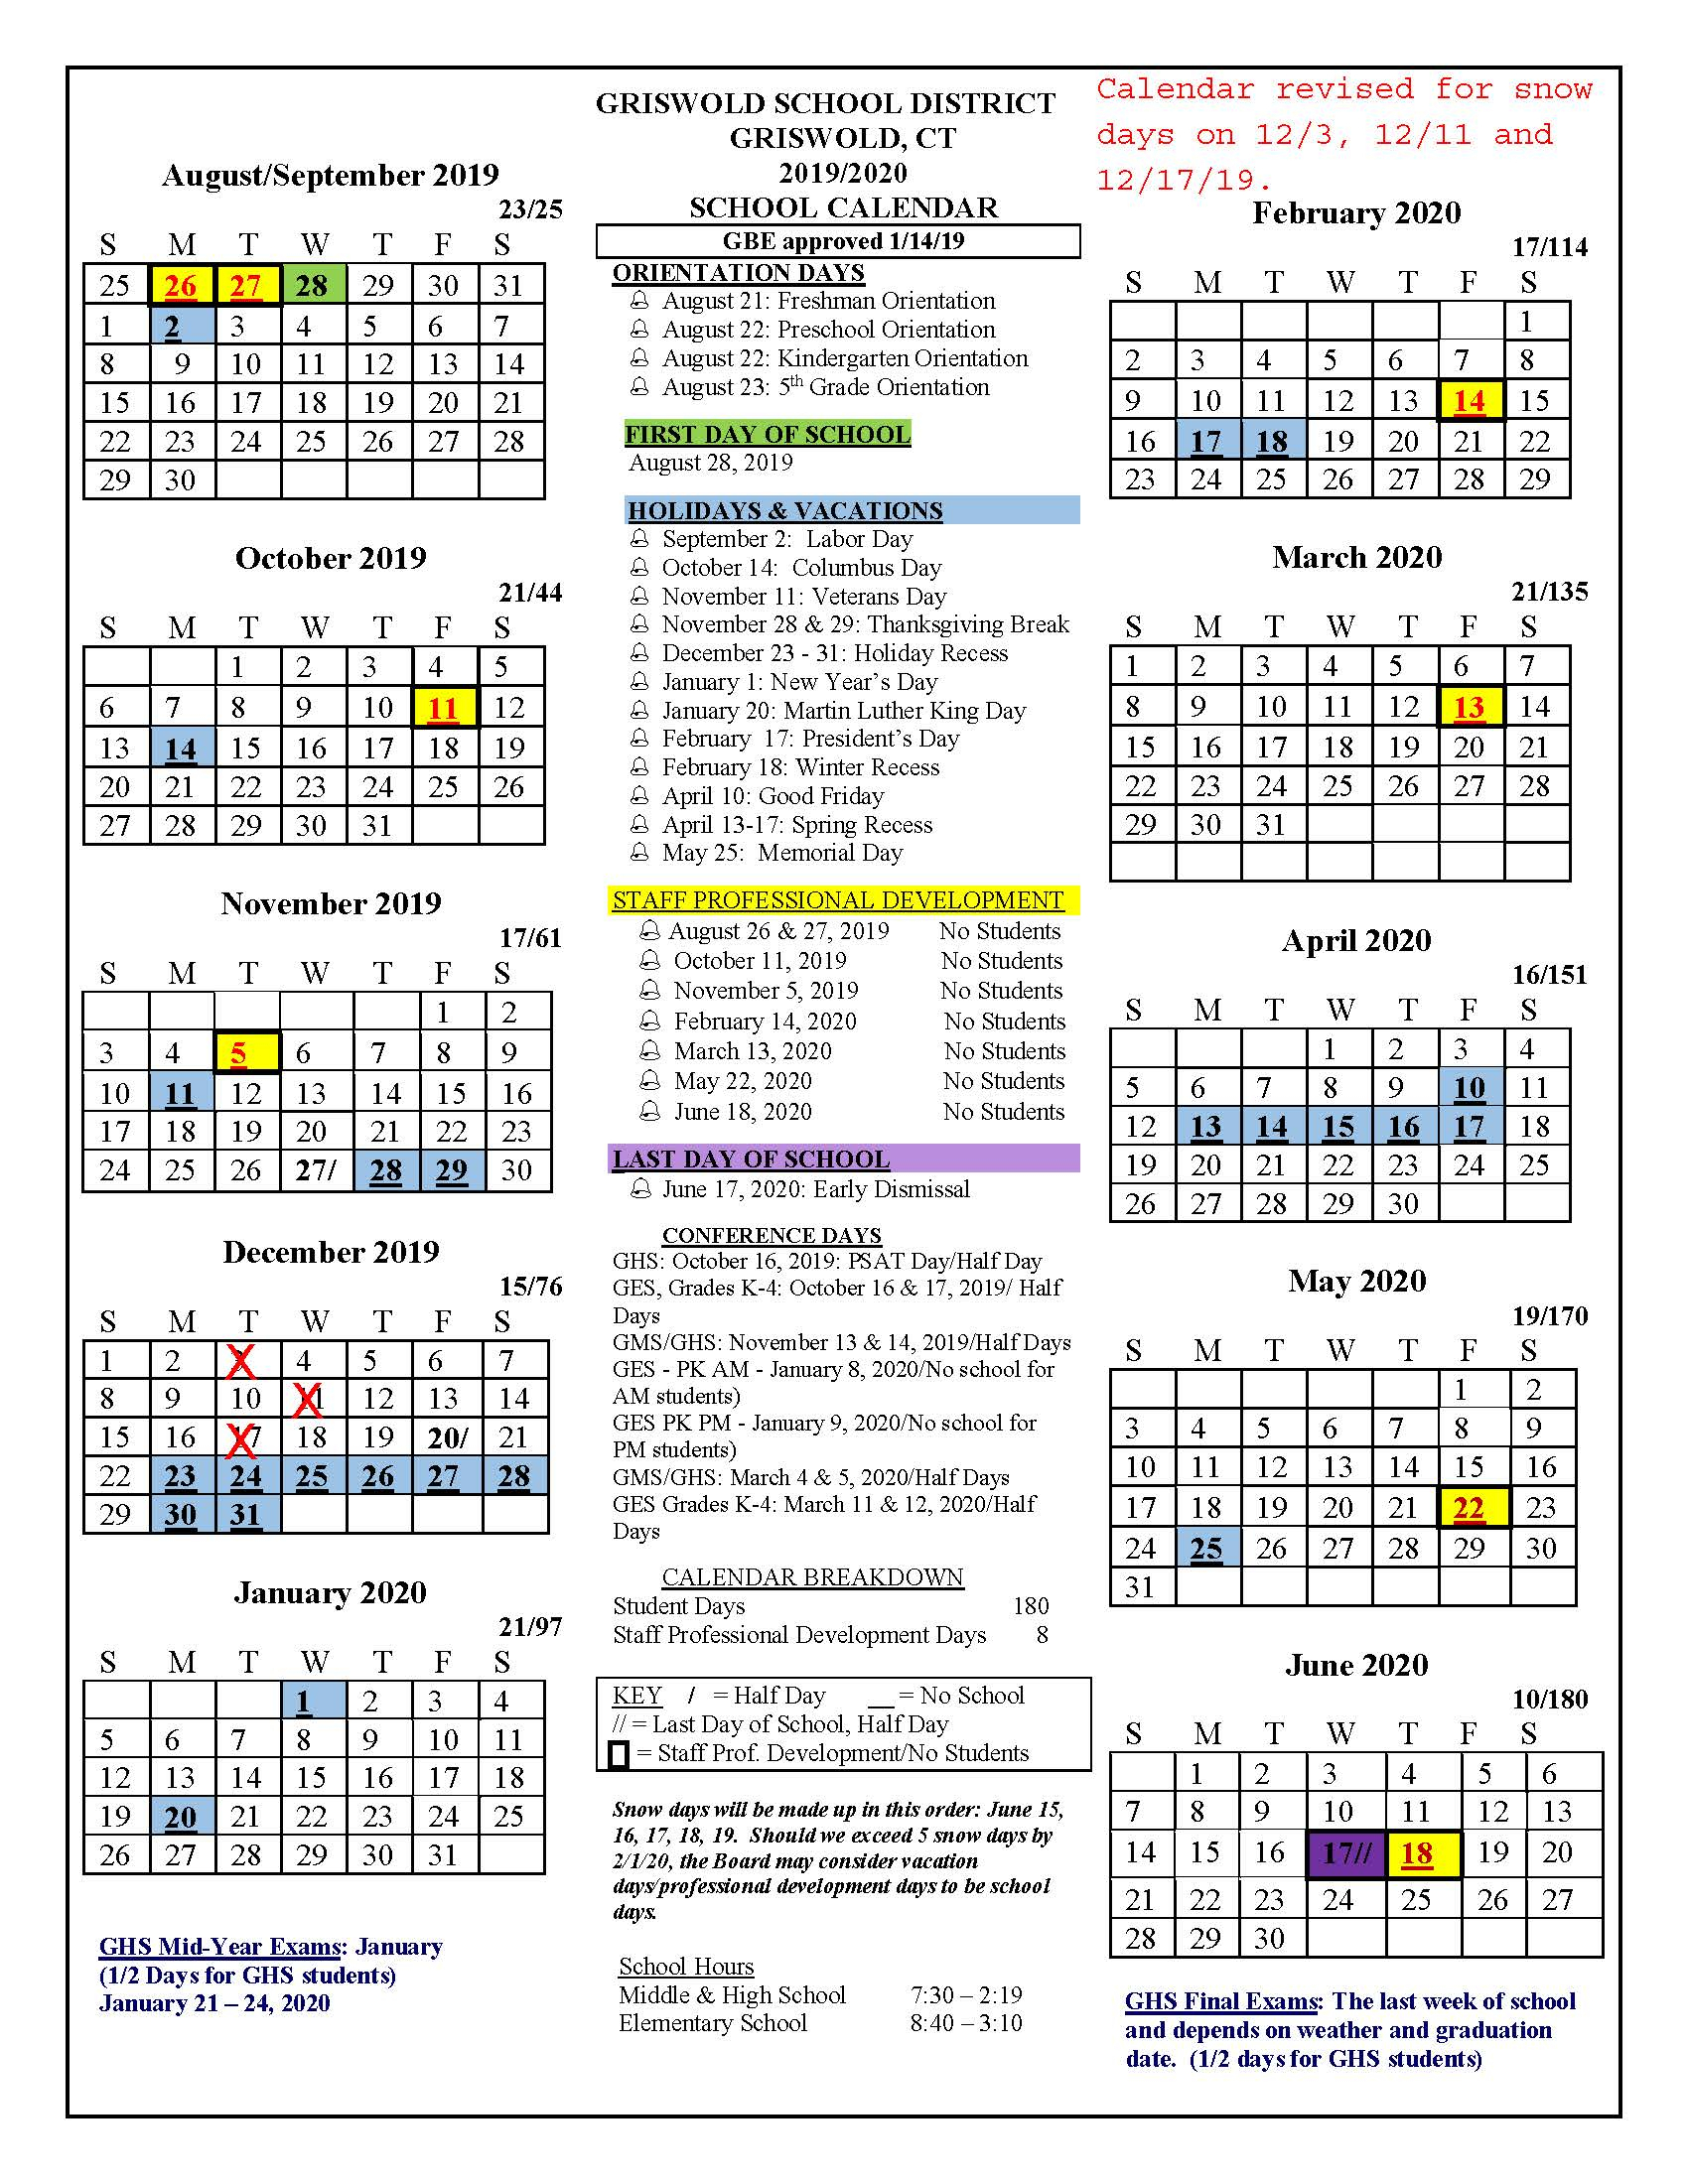 Univ Of Rhode Island School Calendar | Printable Calendar Inside Las Cruces Public Schools Calendar 2021 20